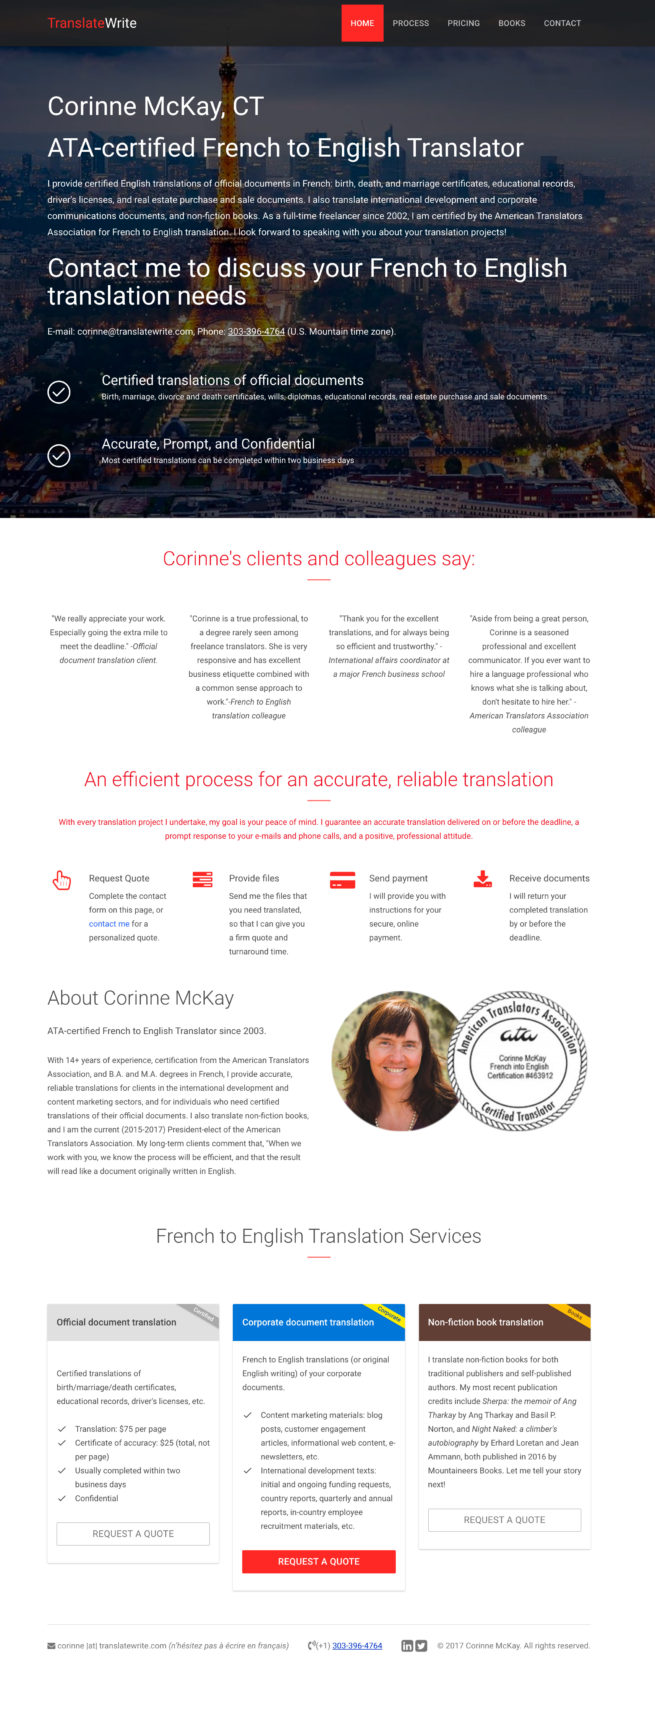 translate-write-web-sample